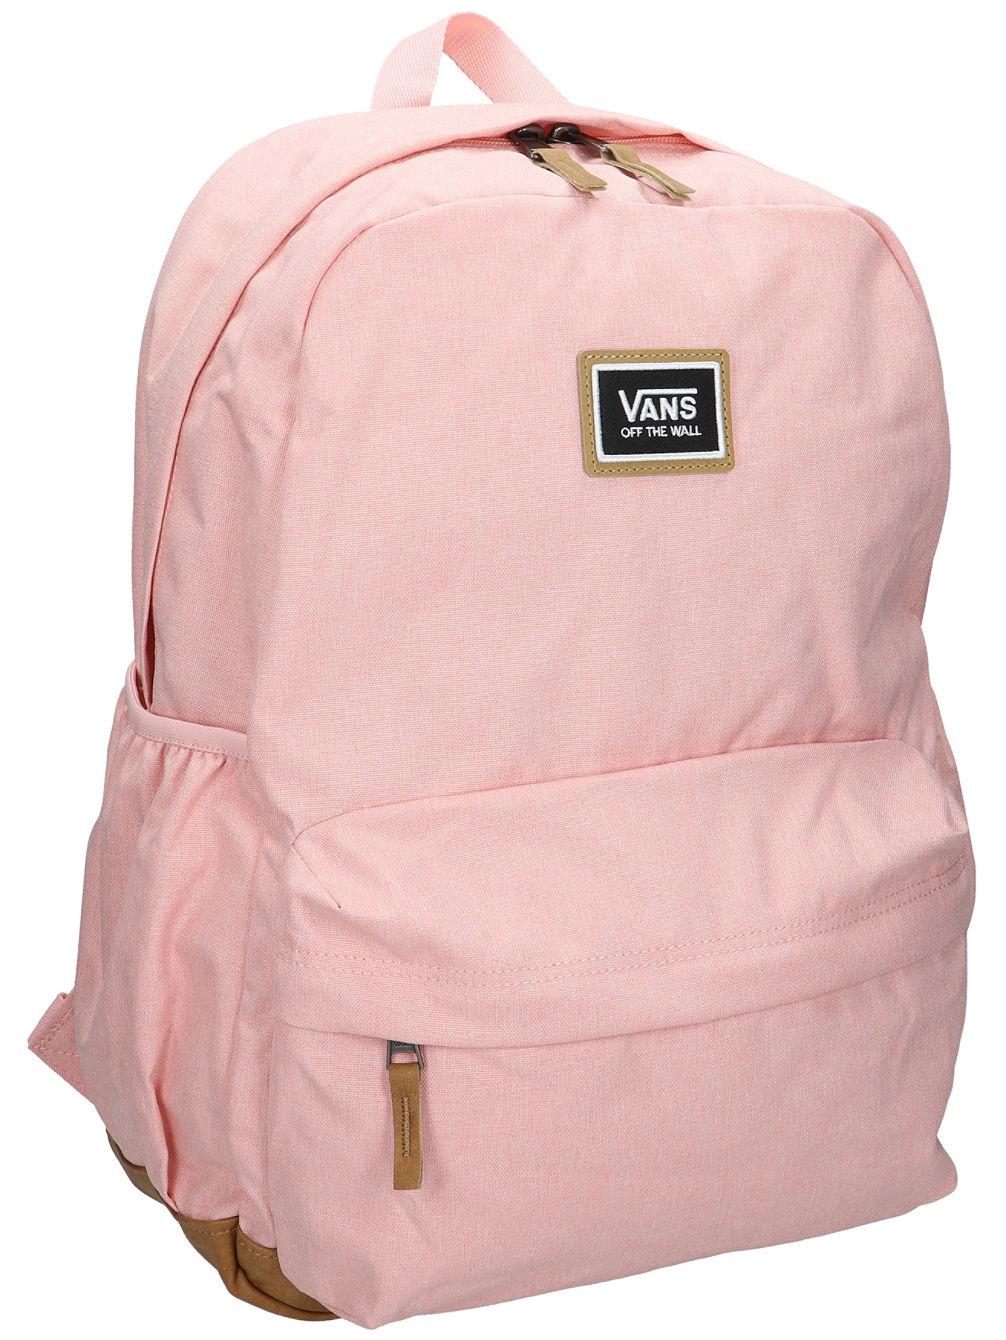 d46d81883ec505 Vans Backpack Buy Online India- Fenix Toulouse Handball